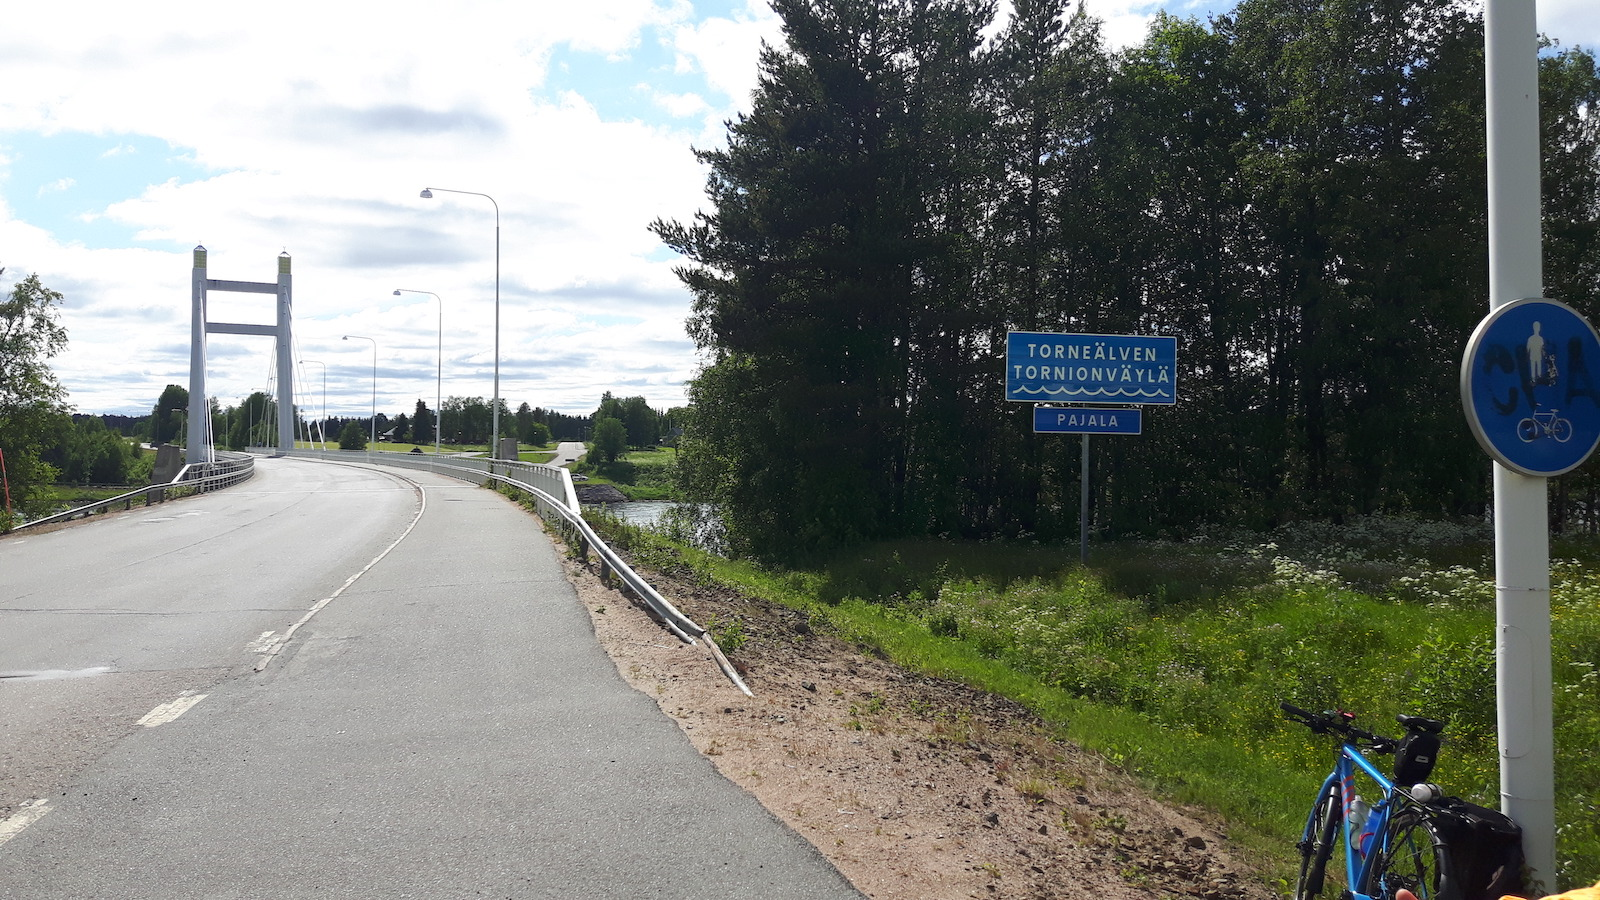 Approaching Pajala Sweden